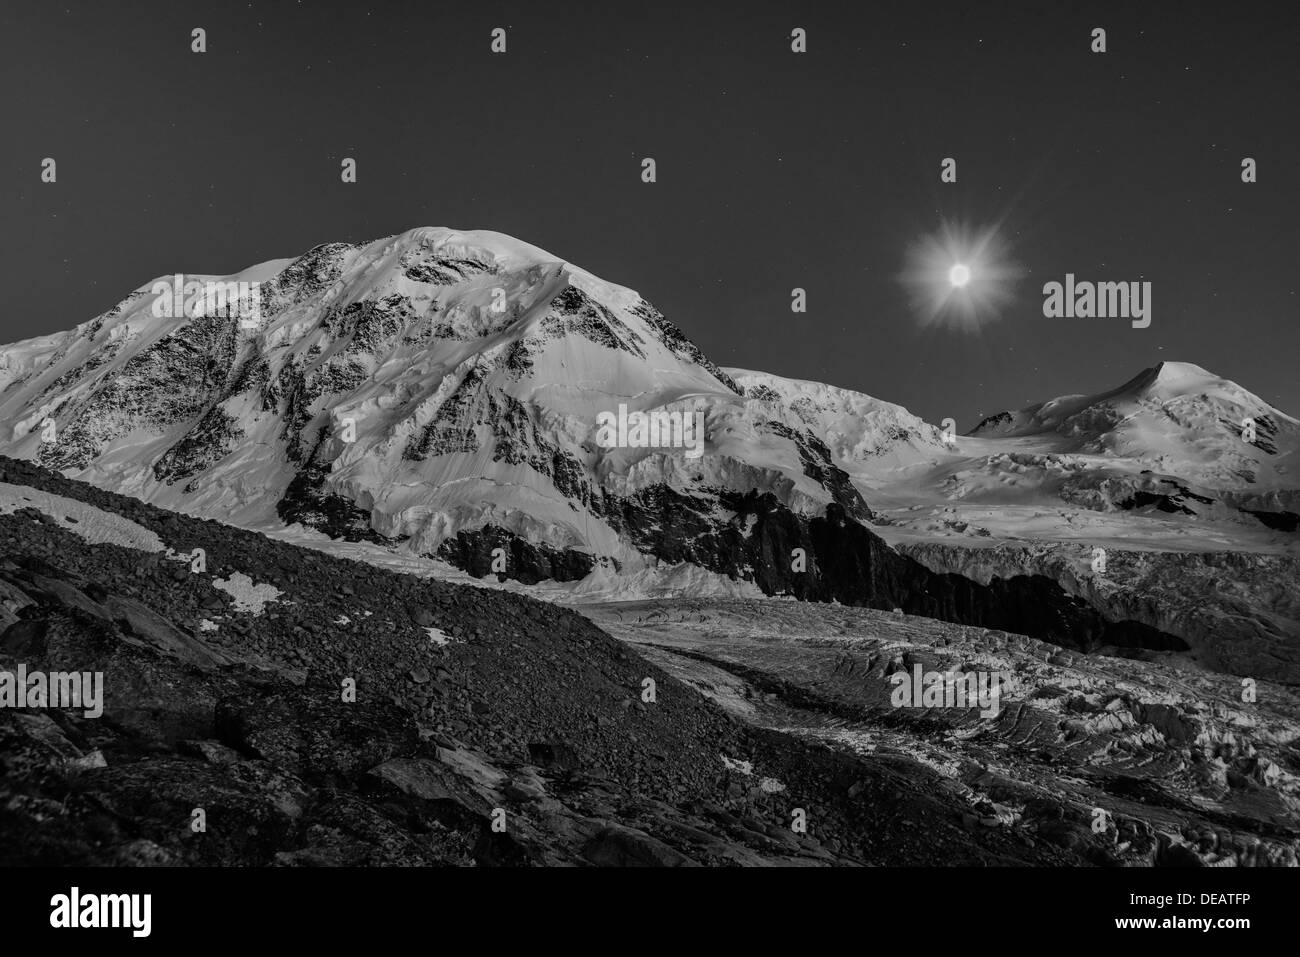 A moonlit night over Liskamm, Stock Photo